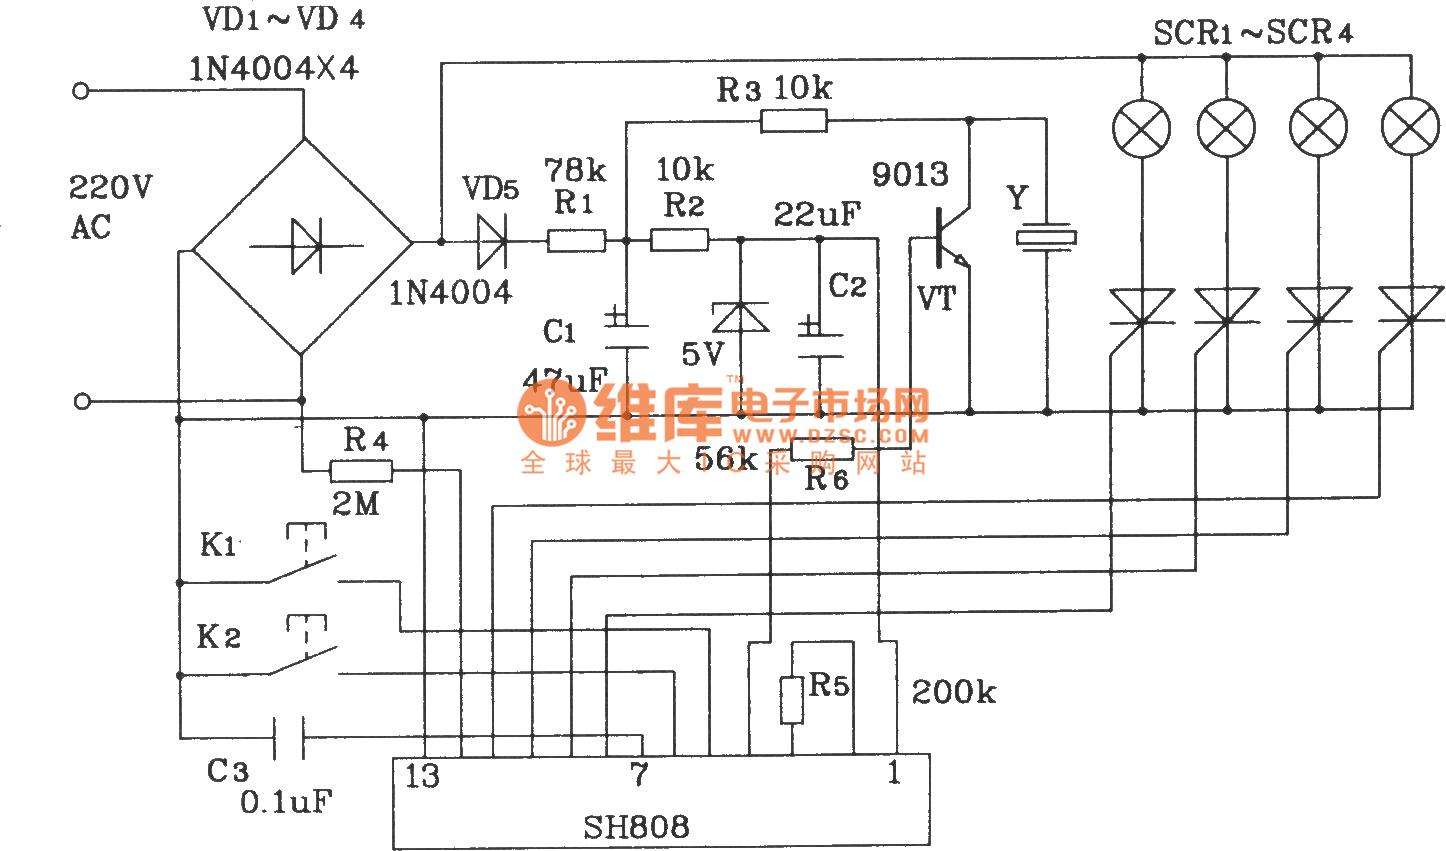 Lampcontrol Ledandlightcircuit Circuit Diagram Seekiccom Wiring Power Amplifier Audiocircuit Color Lamp Control Composed Of Sh808 Multifunction Music